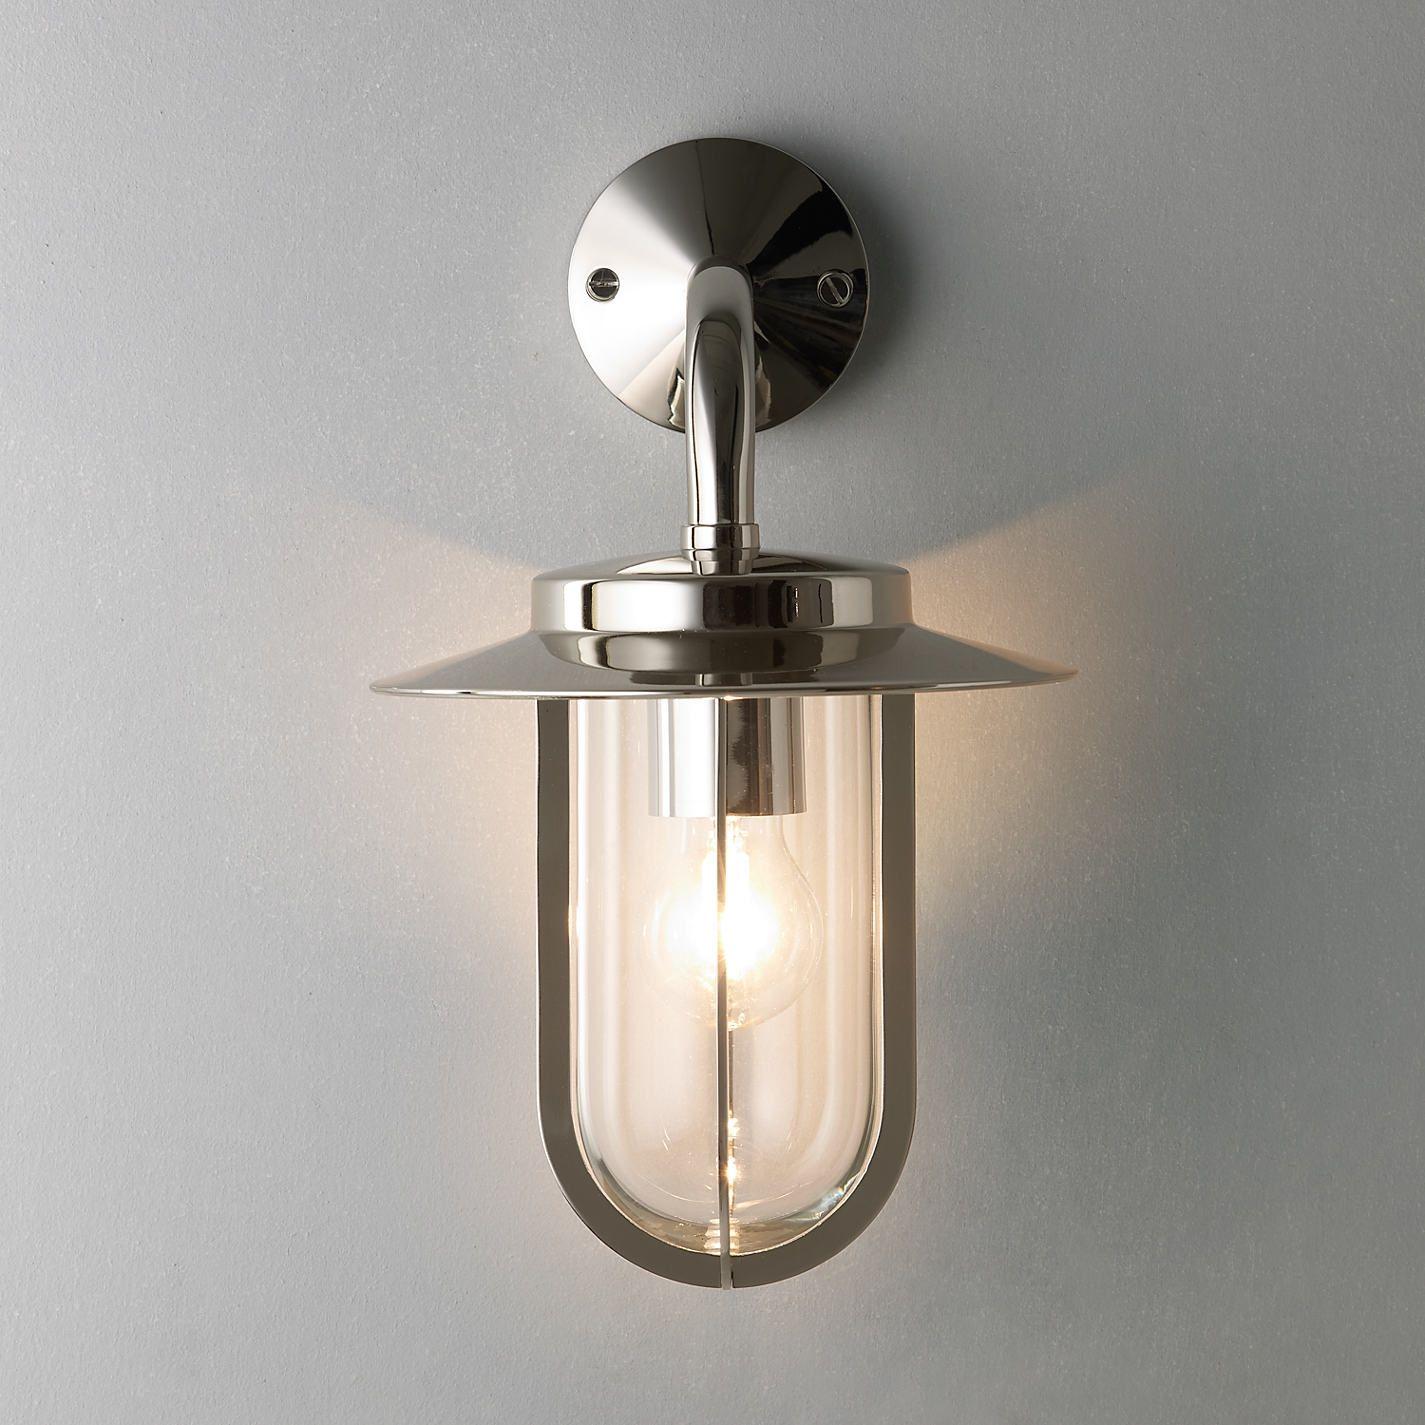 John Lewis Bathroom Light Fittings Porch Lighting Wall Lights Outdoor Wall Lighting